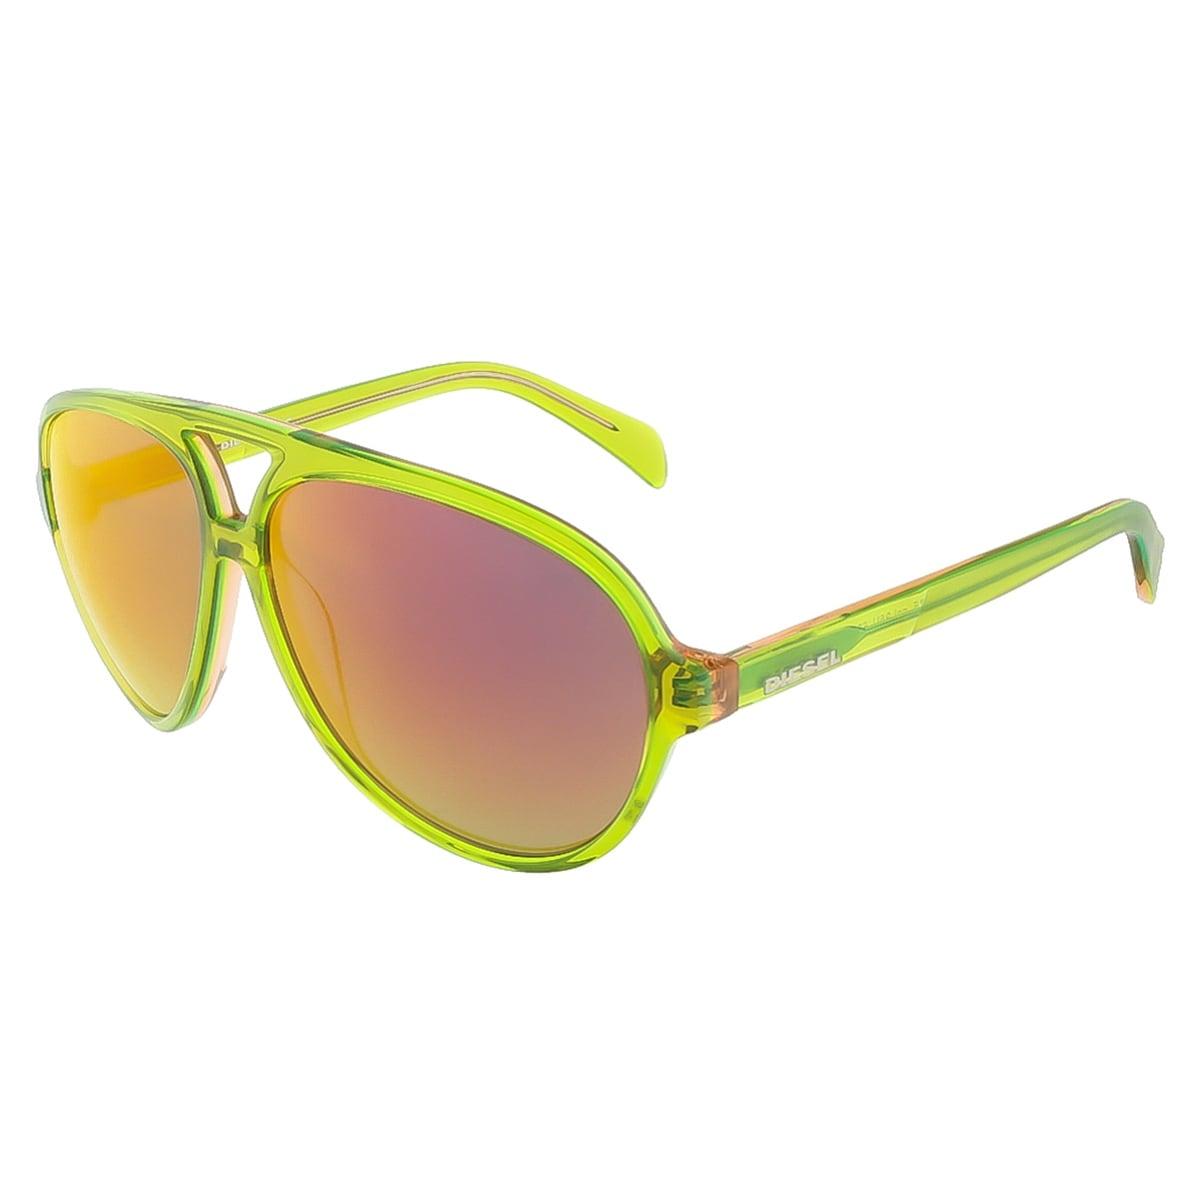 0bf8515119 Diesel DL0075 S 95U Translucent Lime Green Teardrop Aviator sunglasses -  60-12-145